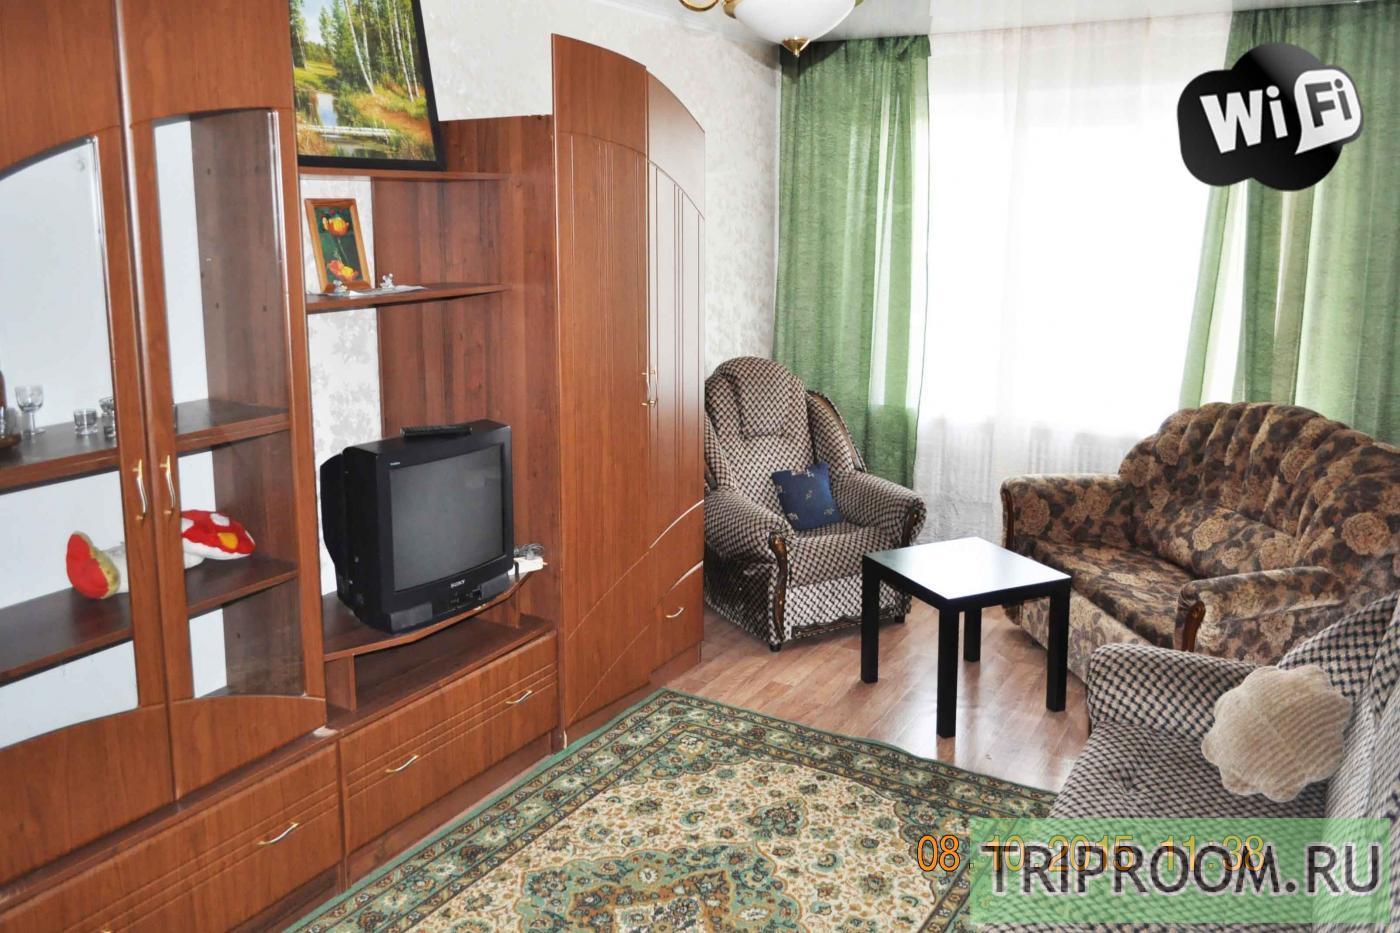 2-комнатная квартира посуточно (вариант № 11708), ул. Амосова улица, фото № 16